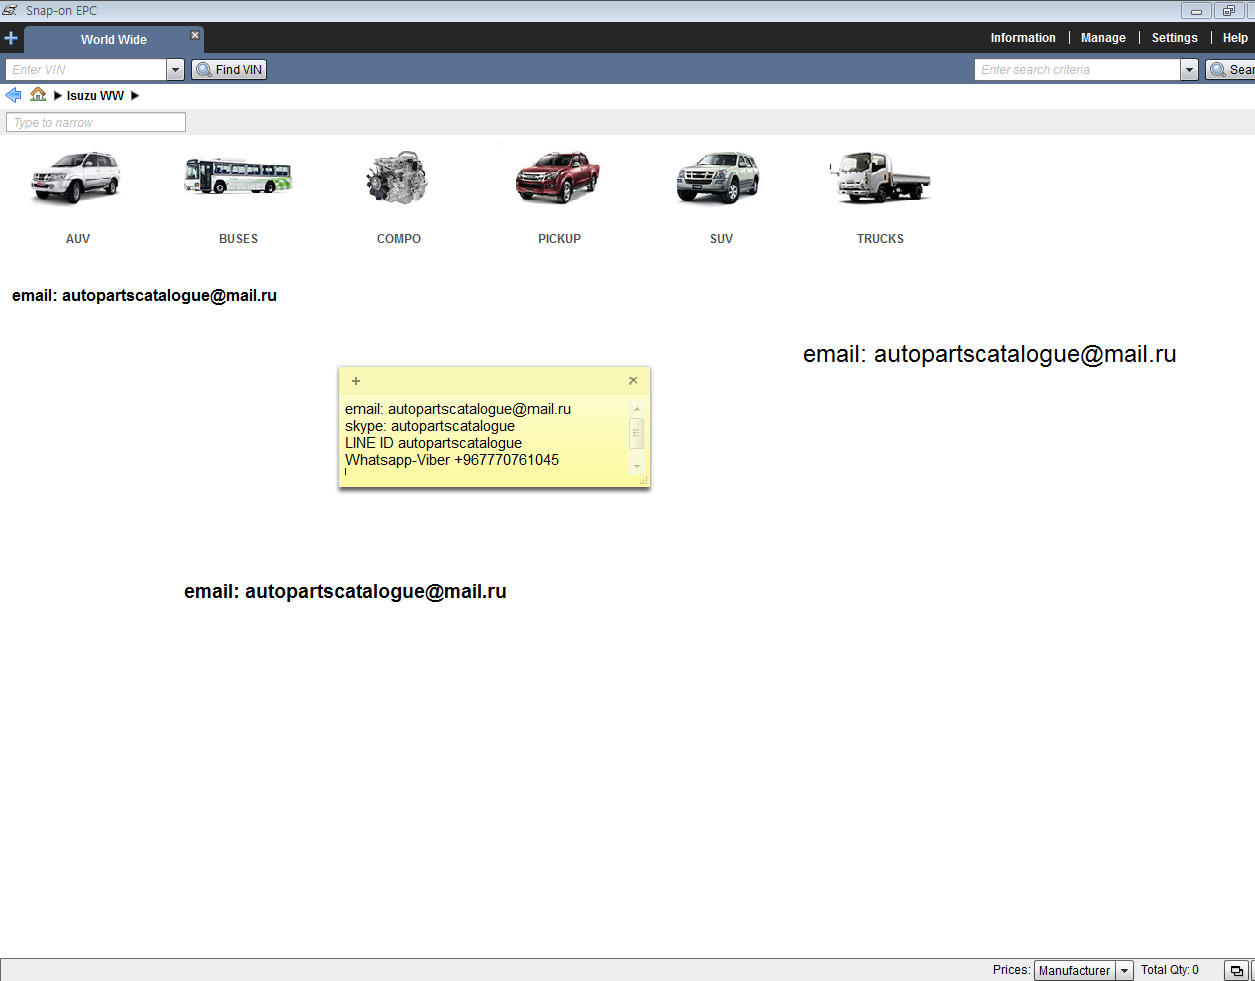 Isuzu Worldwide Epc Parts Catalog 032018 Autopartscatalogue Fvz Wiring Diagram Price Private Message